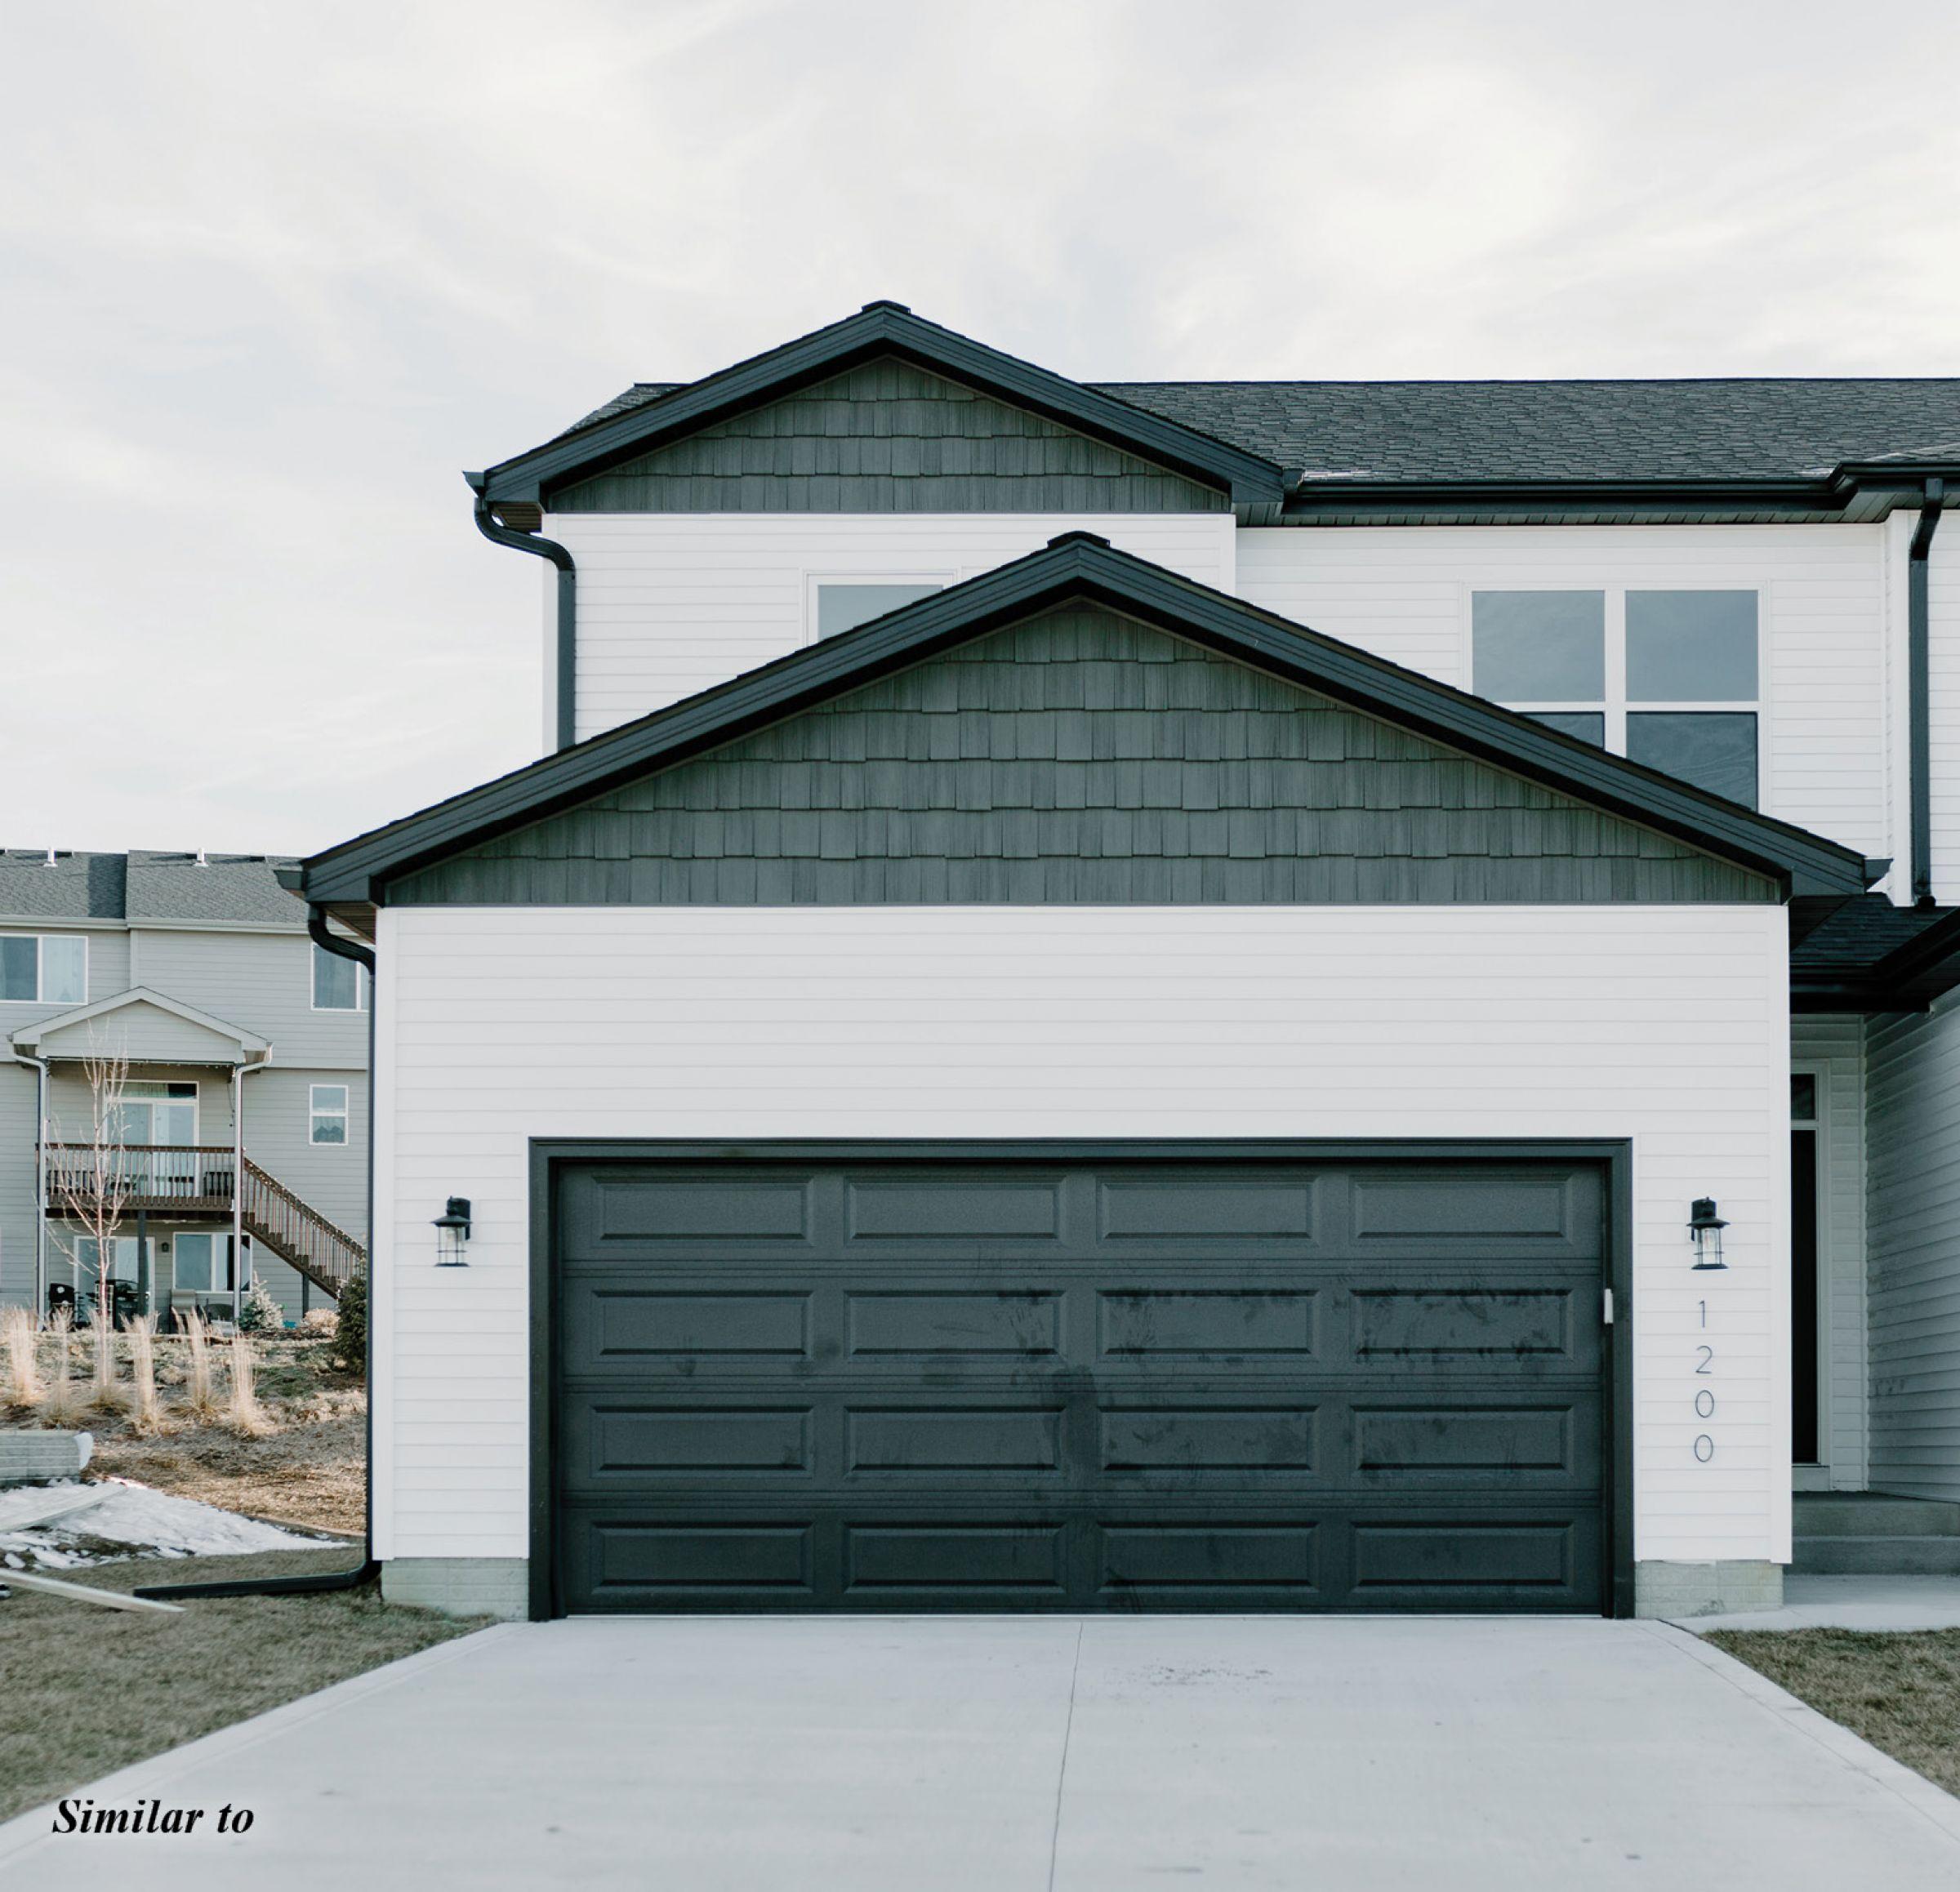 residential-warren-county-iowa-0-acres-listing-number-15674-0-2021-08-06-135141.jpg